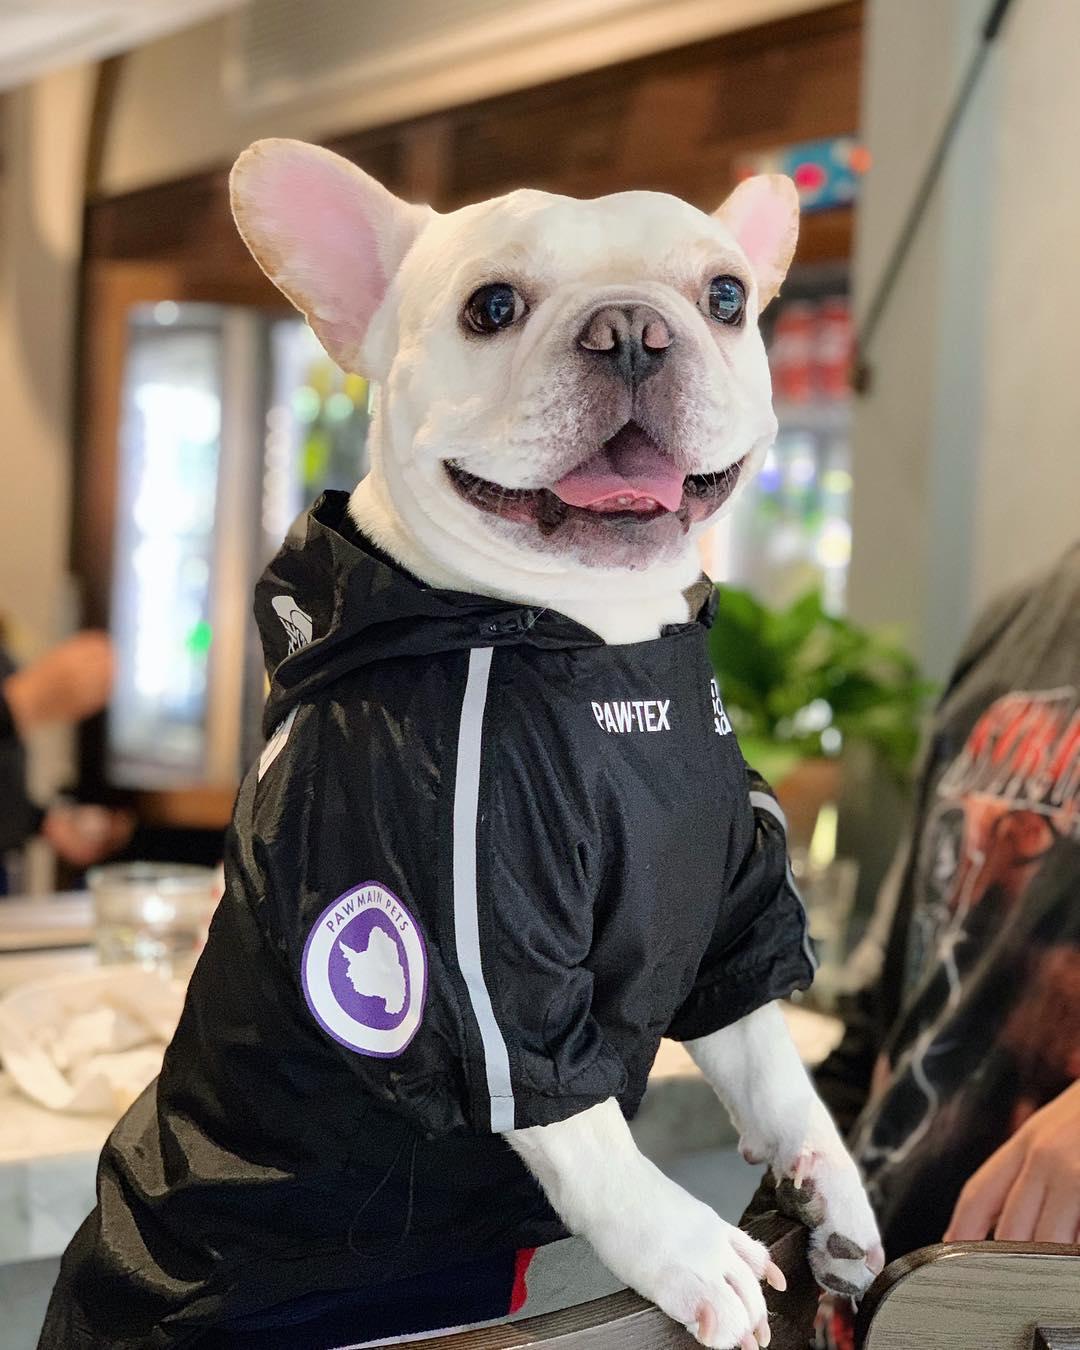 Dog Clothes Adidog French Bulldog Pupreme Shirt Dog Windbreaker Sport Retro Dog Hoodies Pet Clothes Ropa Perro Puppy Dog Pugs